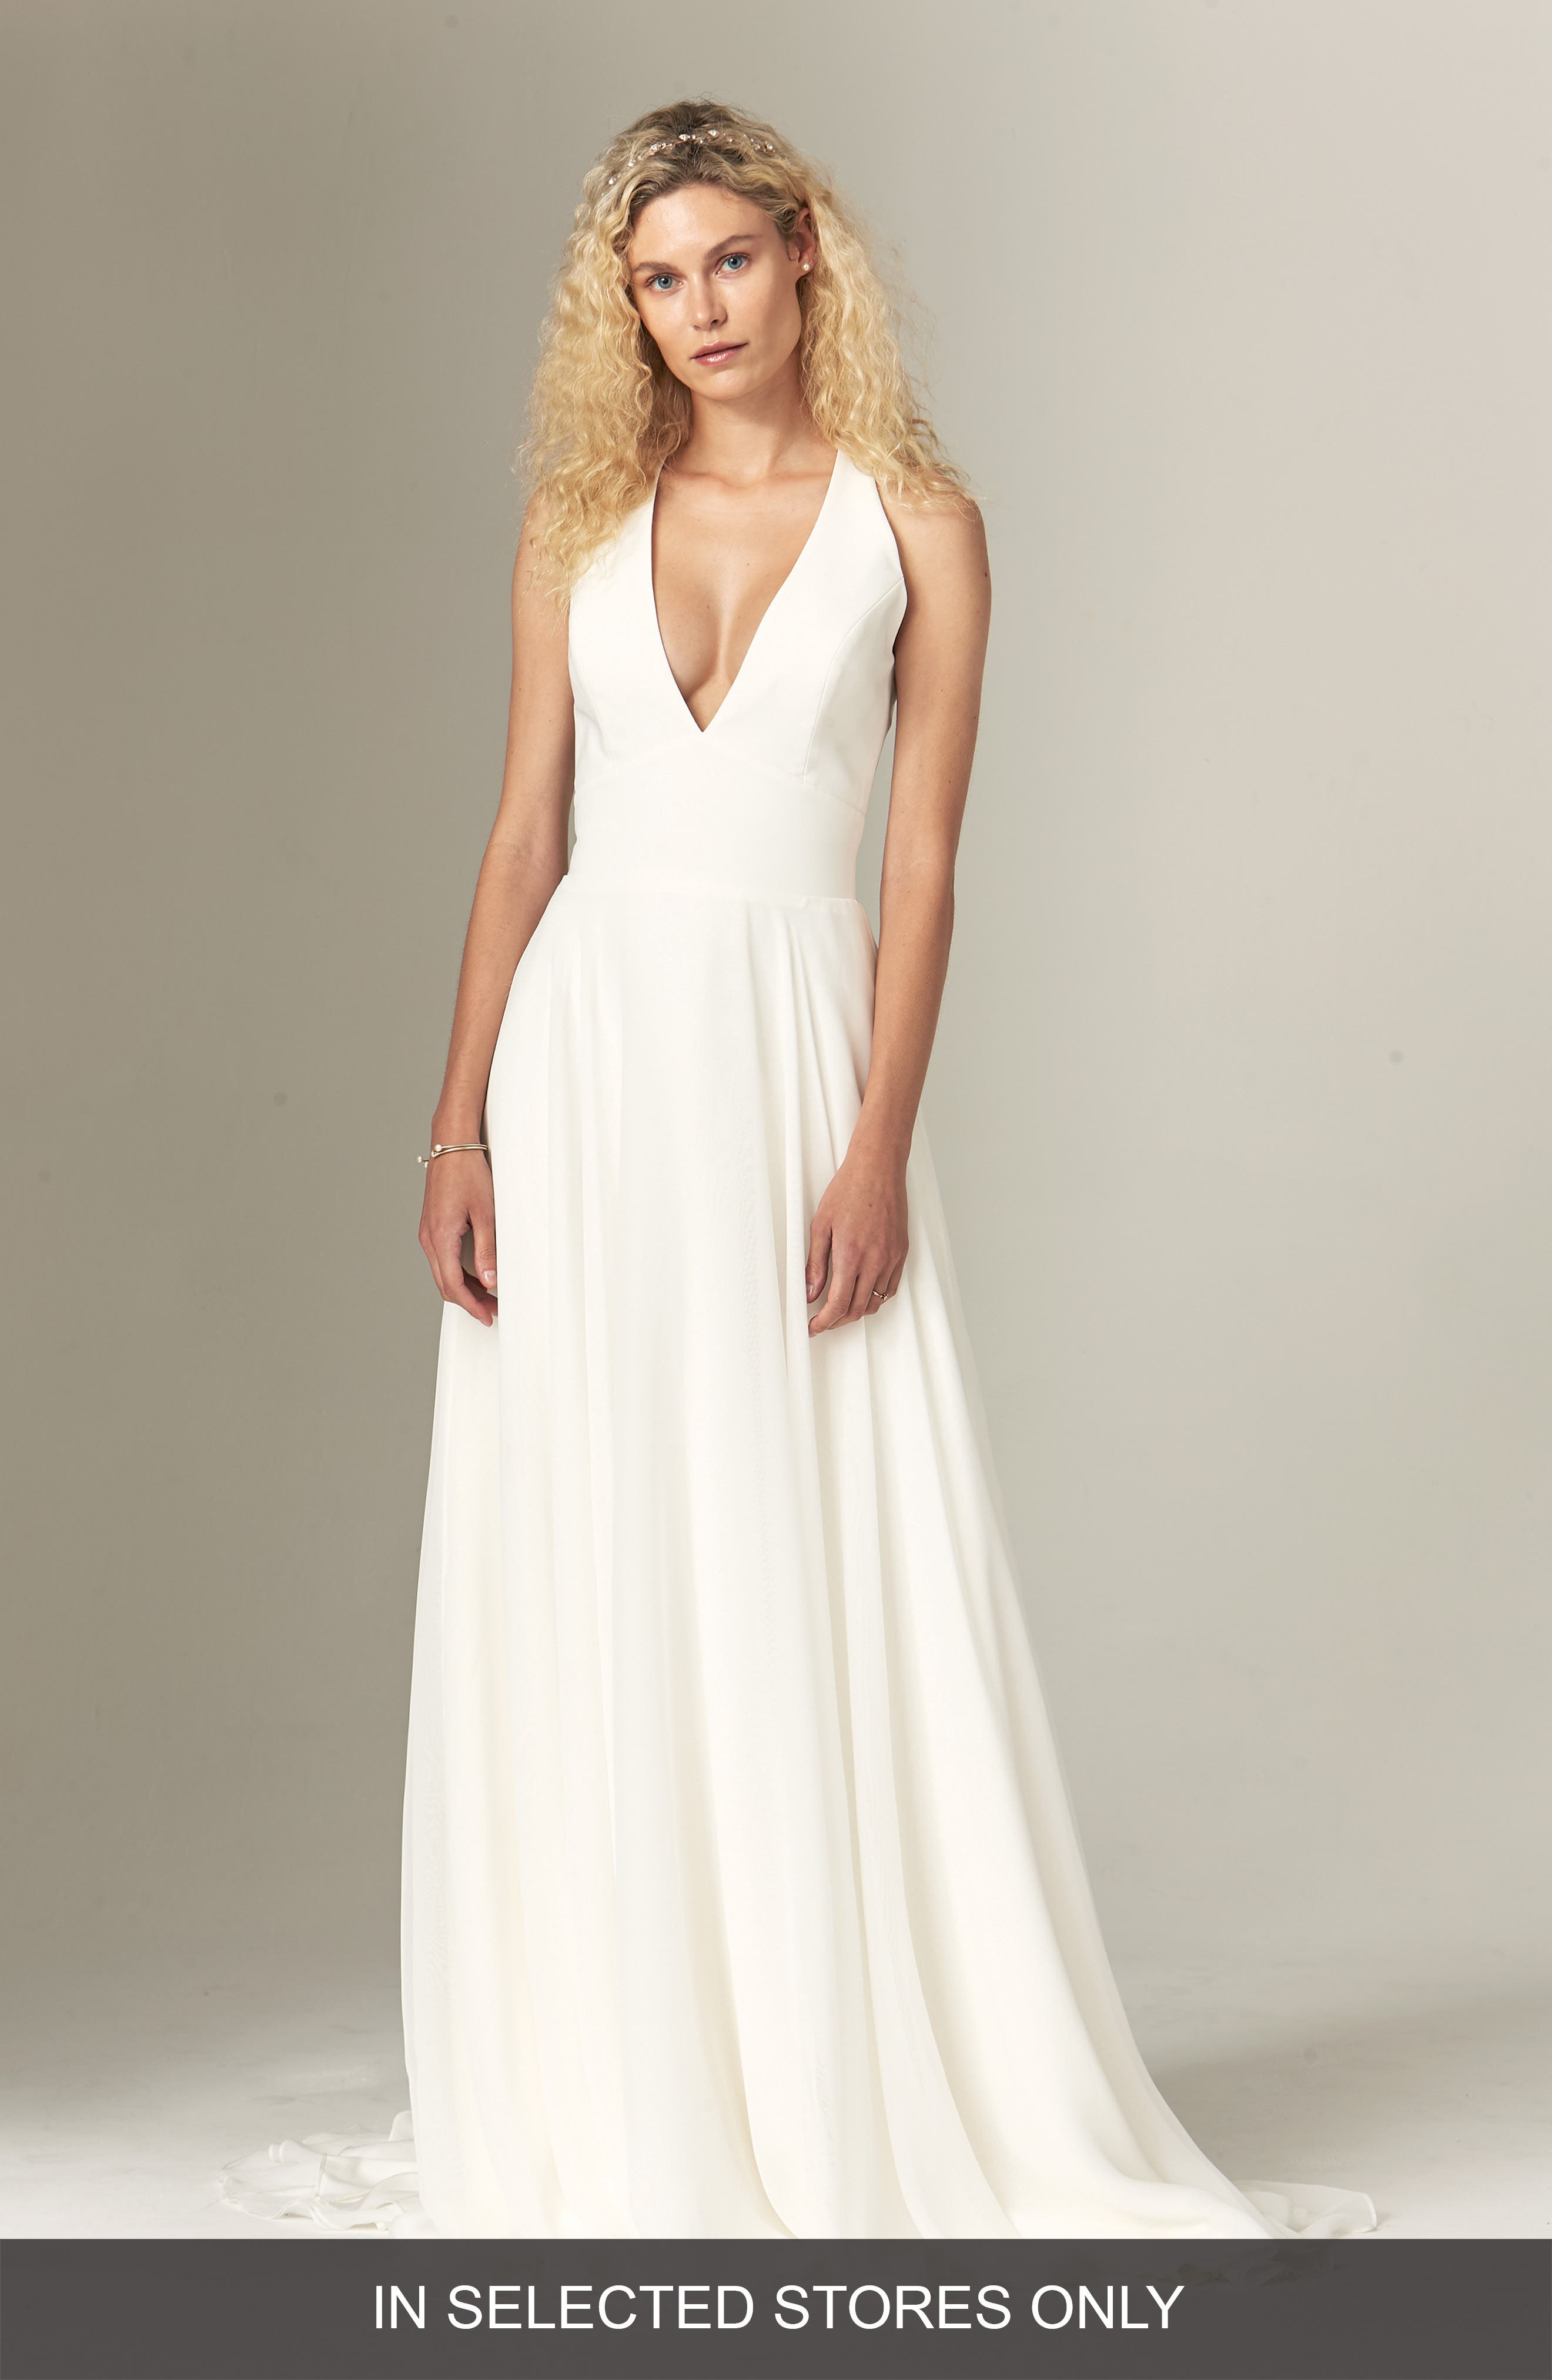 Elizabeth Halter Wedding Dress in Ivory